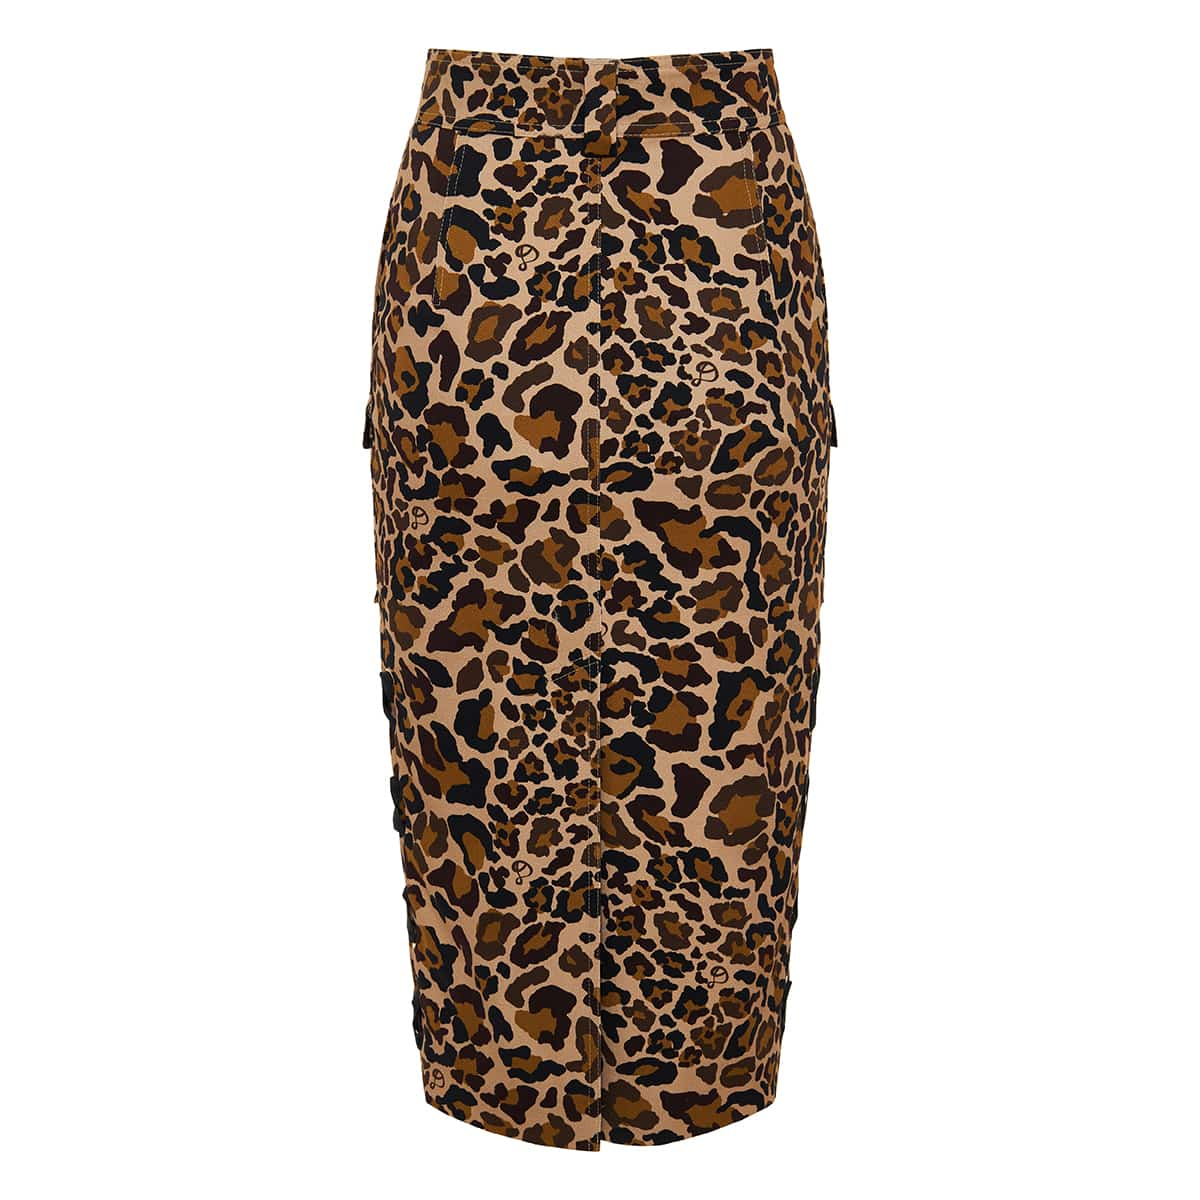 Ryder leopard print midi skirt